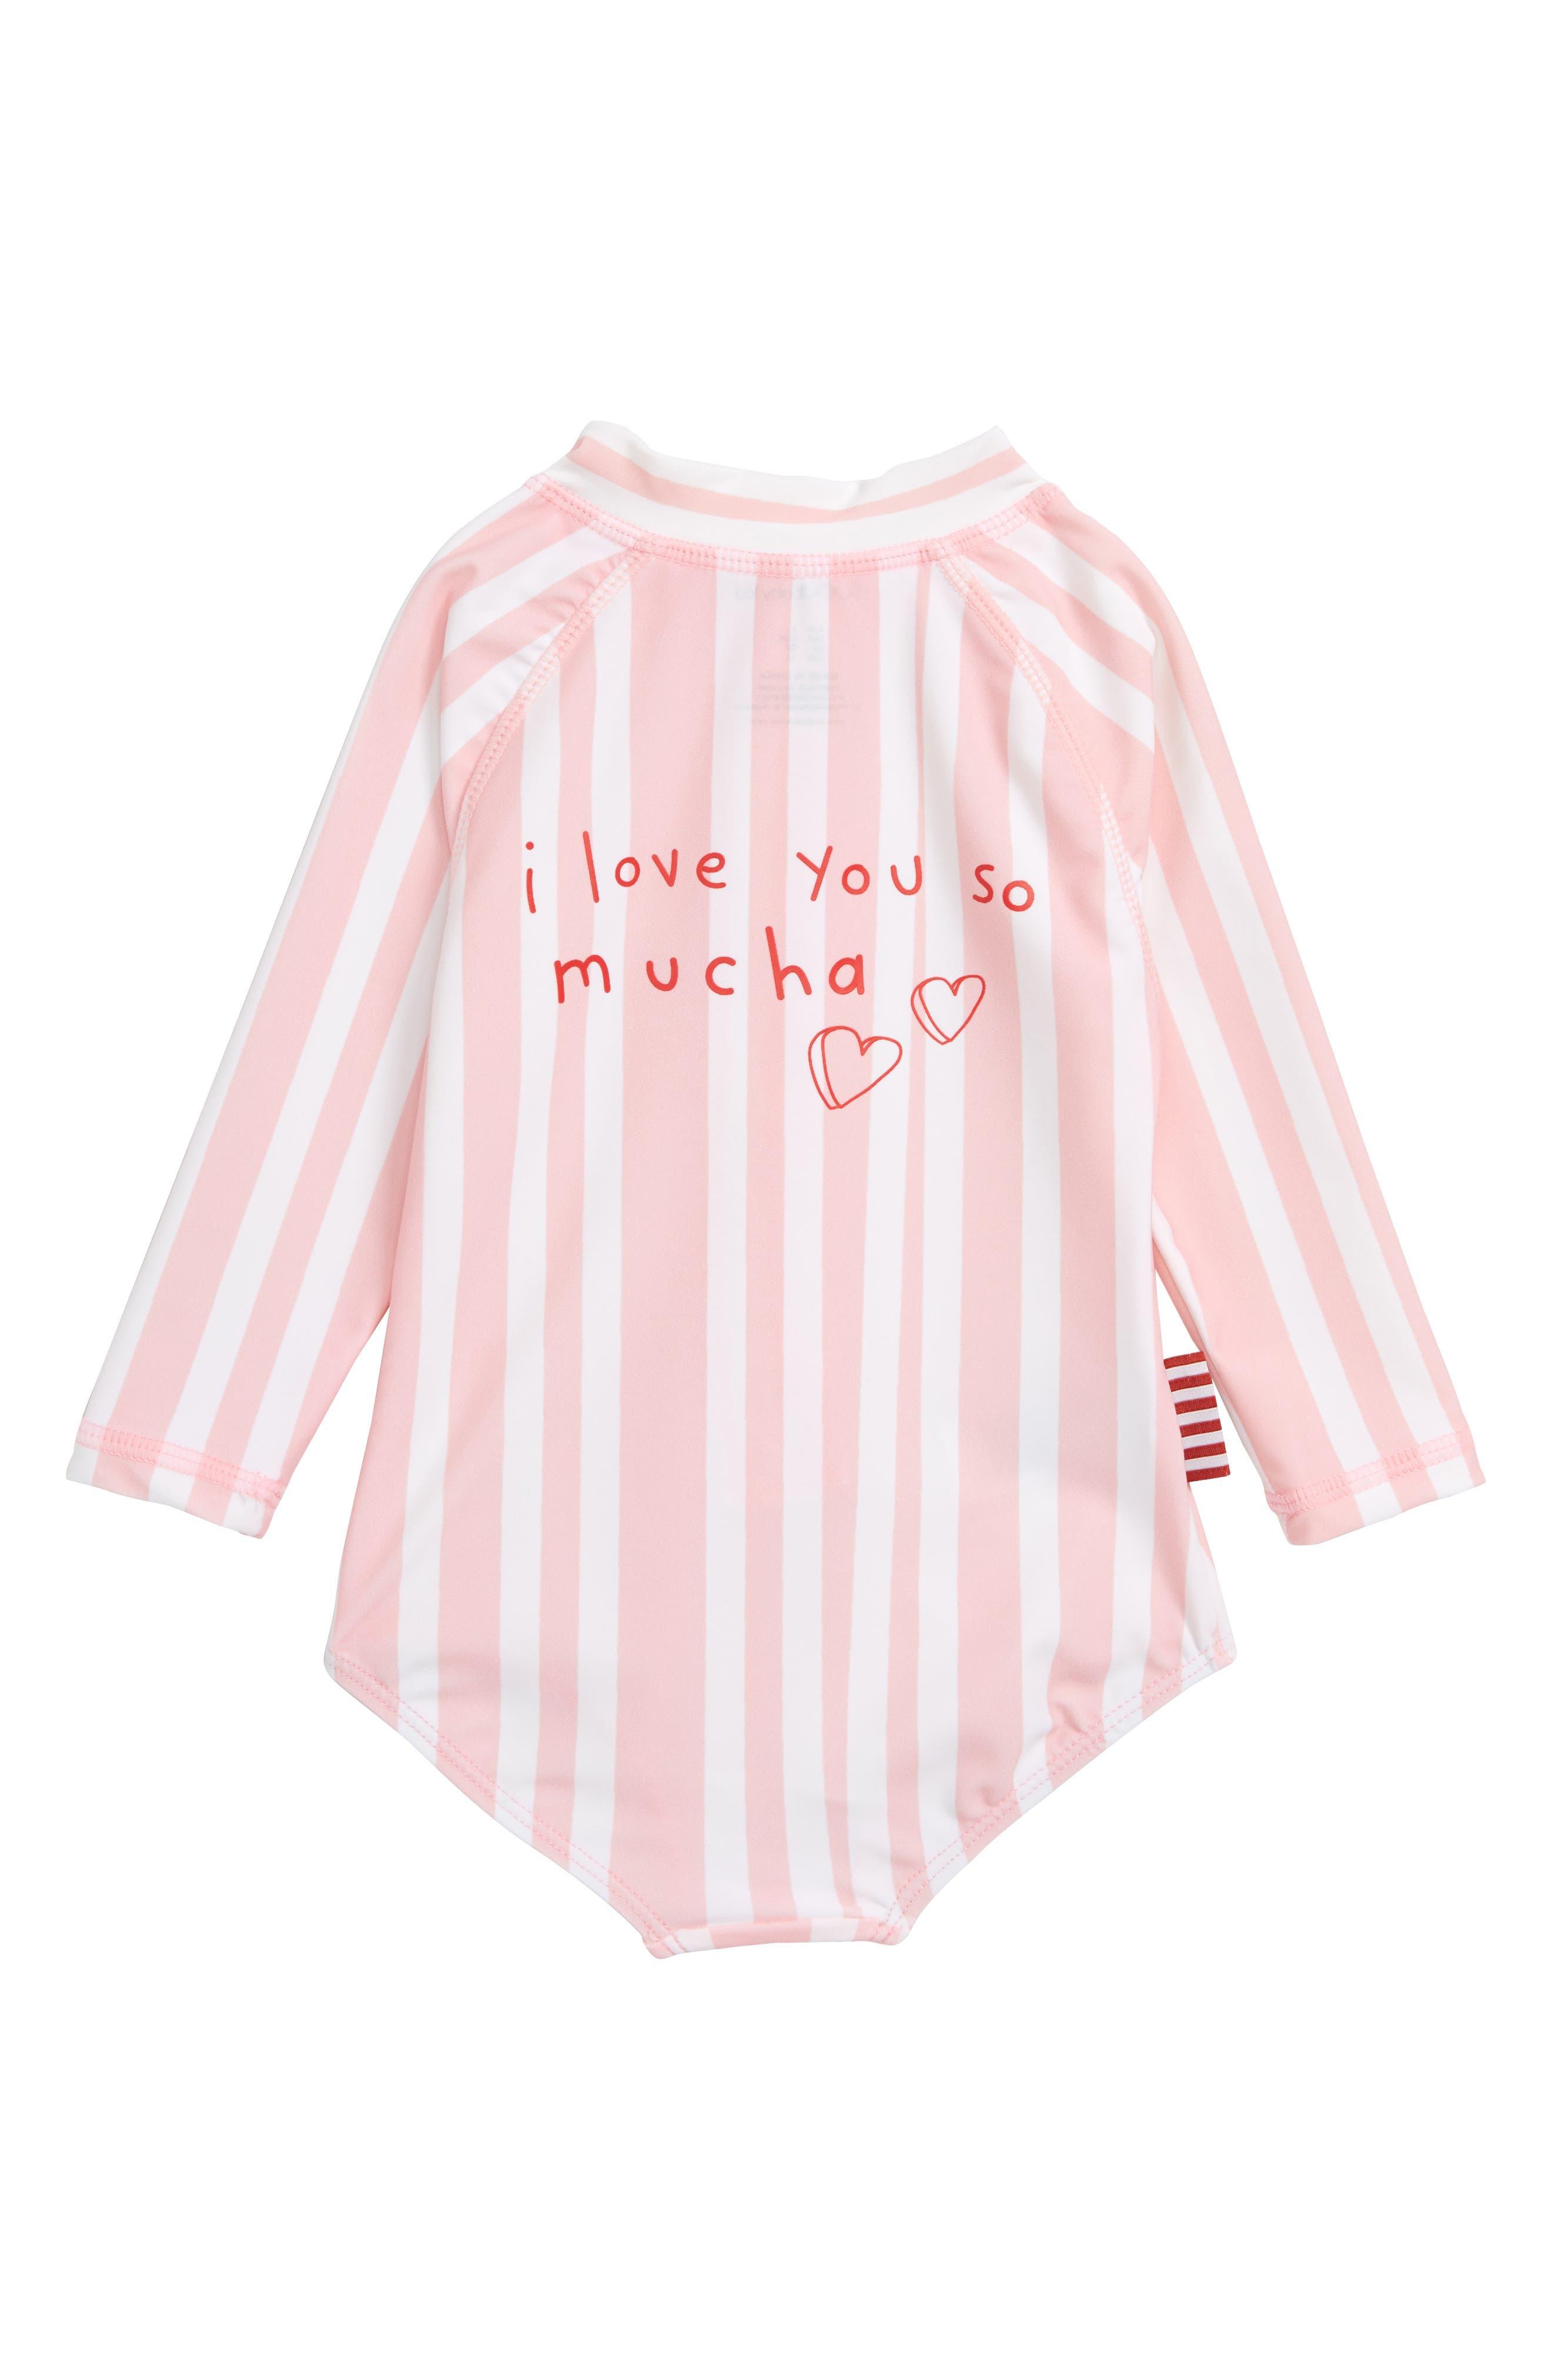 Love You Mucha One-Piece Rashguard Swimsuit,                             Alternate thumbnail 2, color,                             650